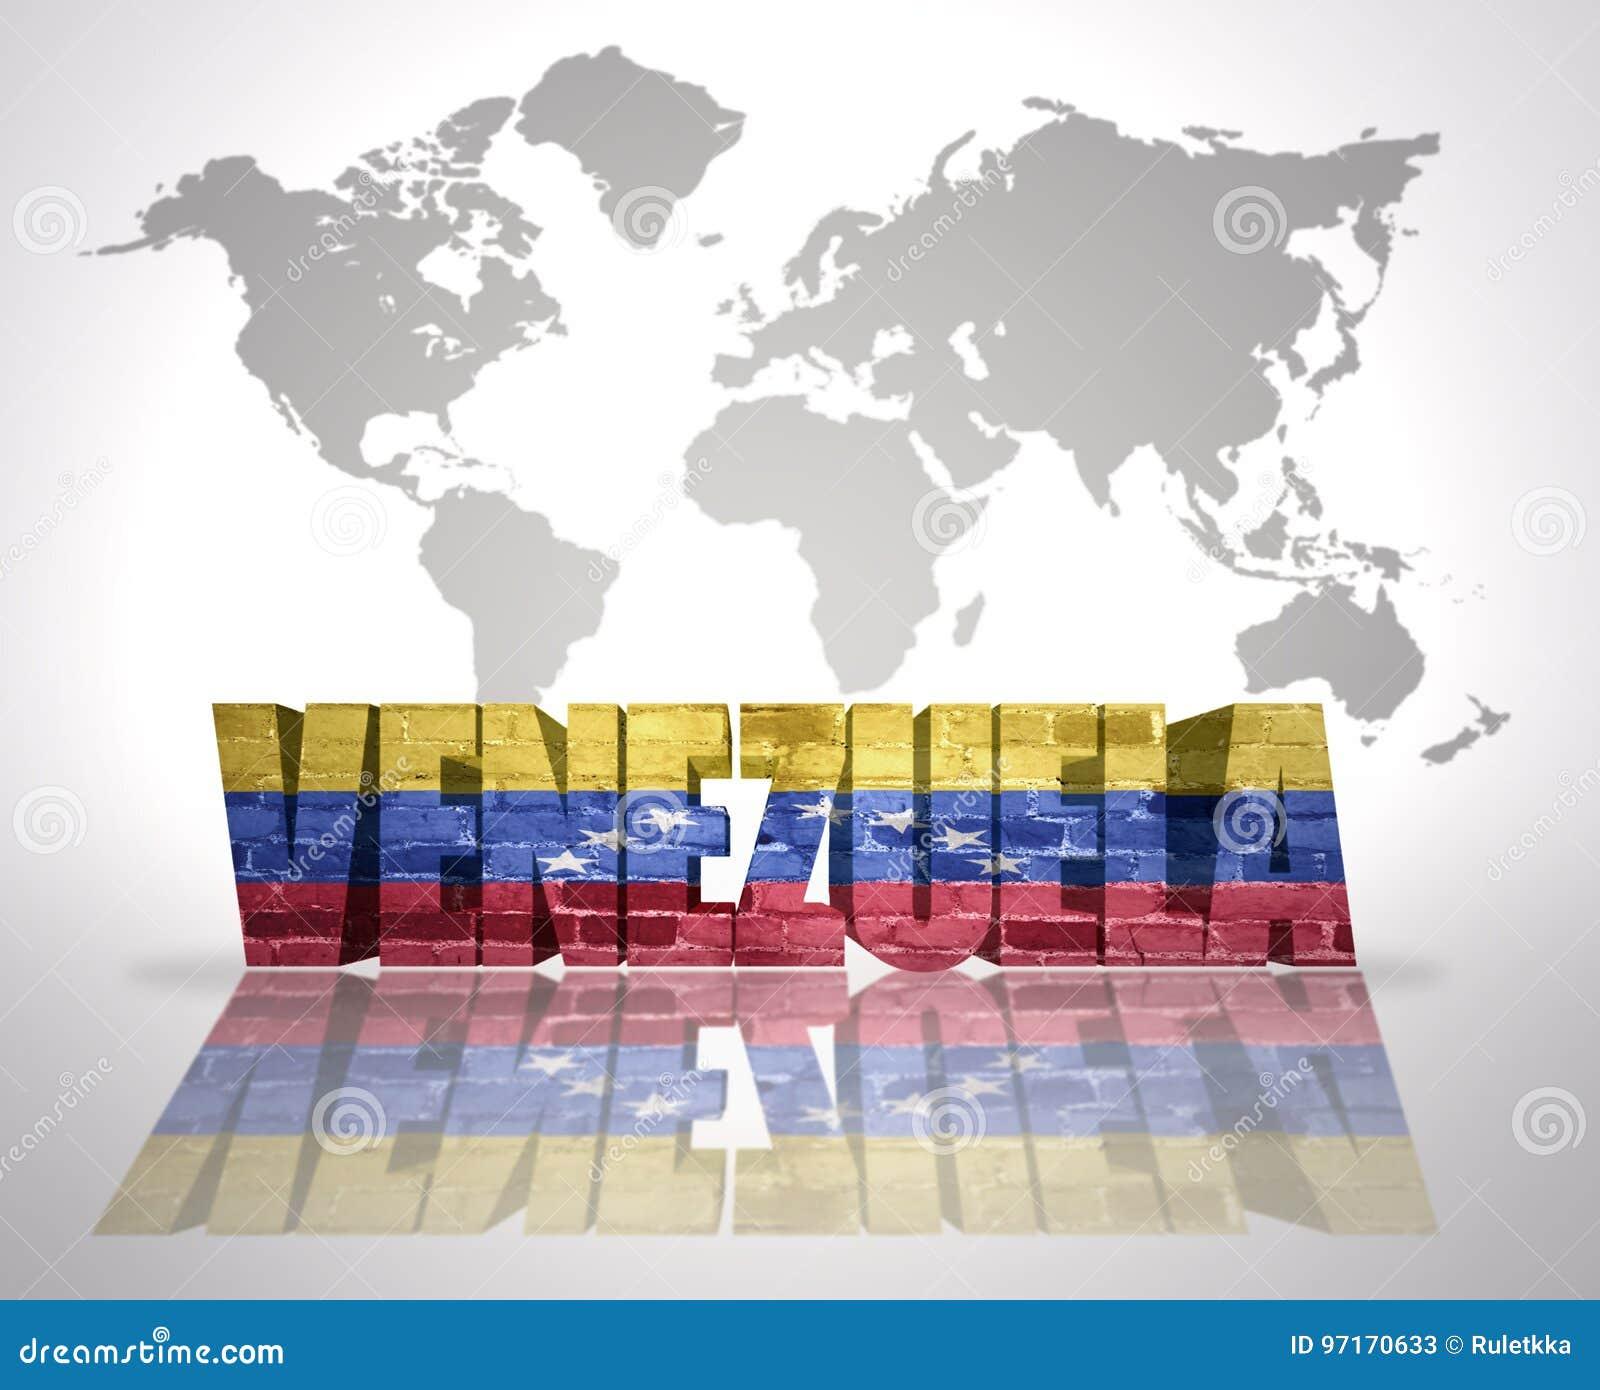 Word Venezuela On A World Map Background Stock Illustration ...